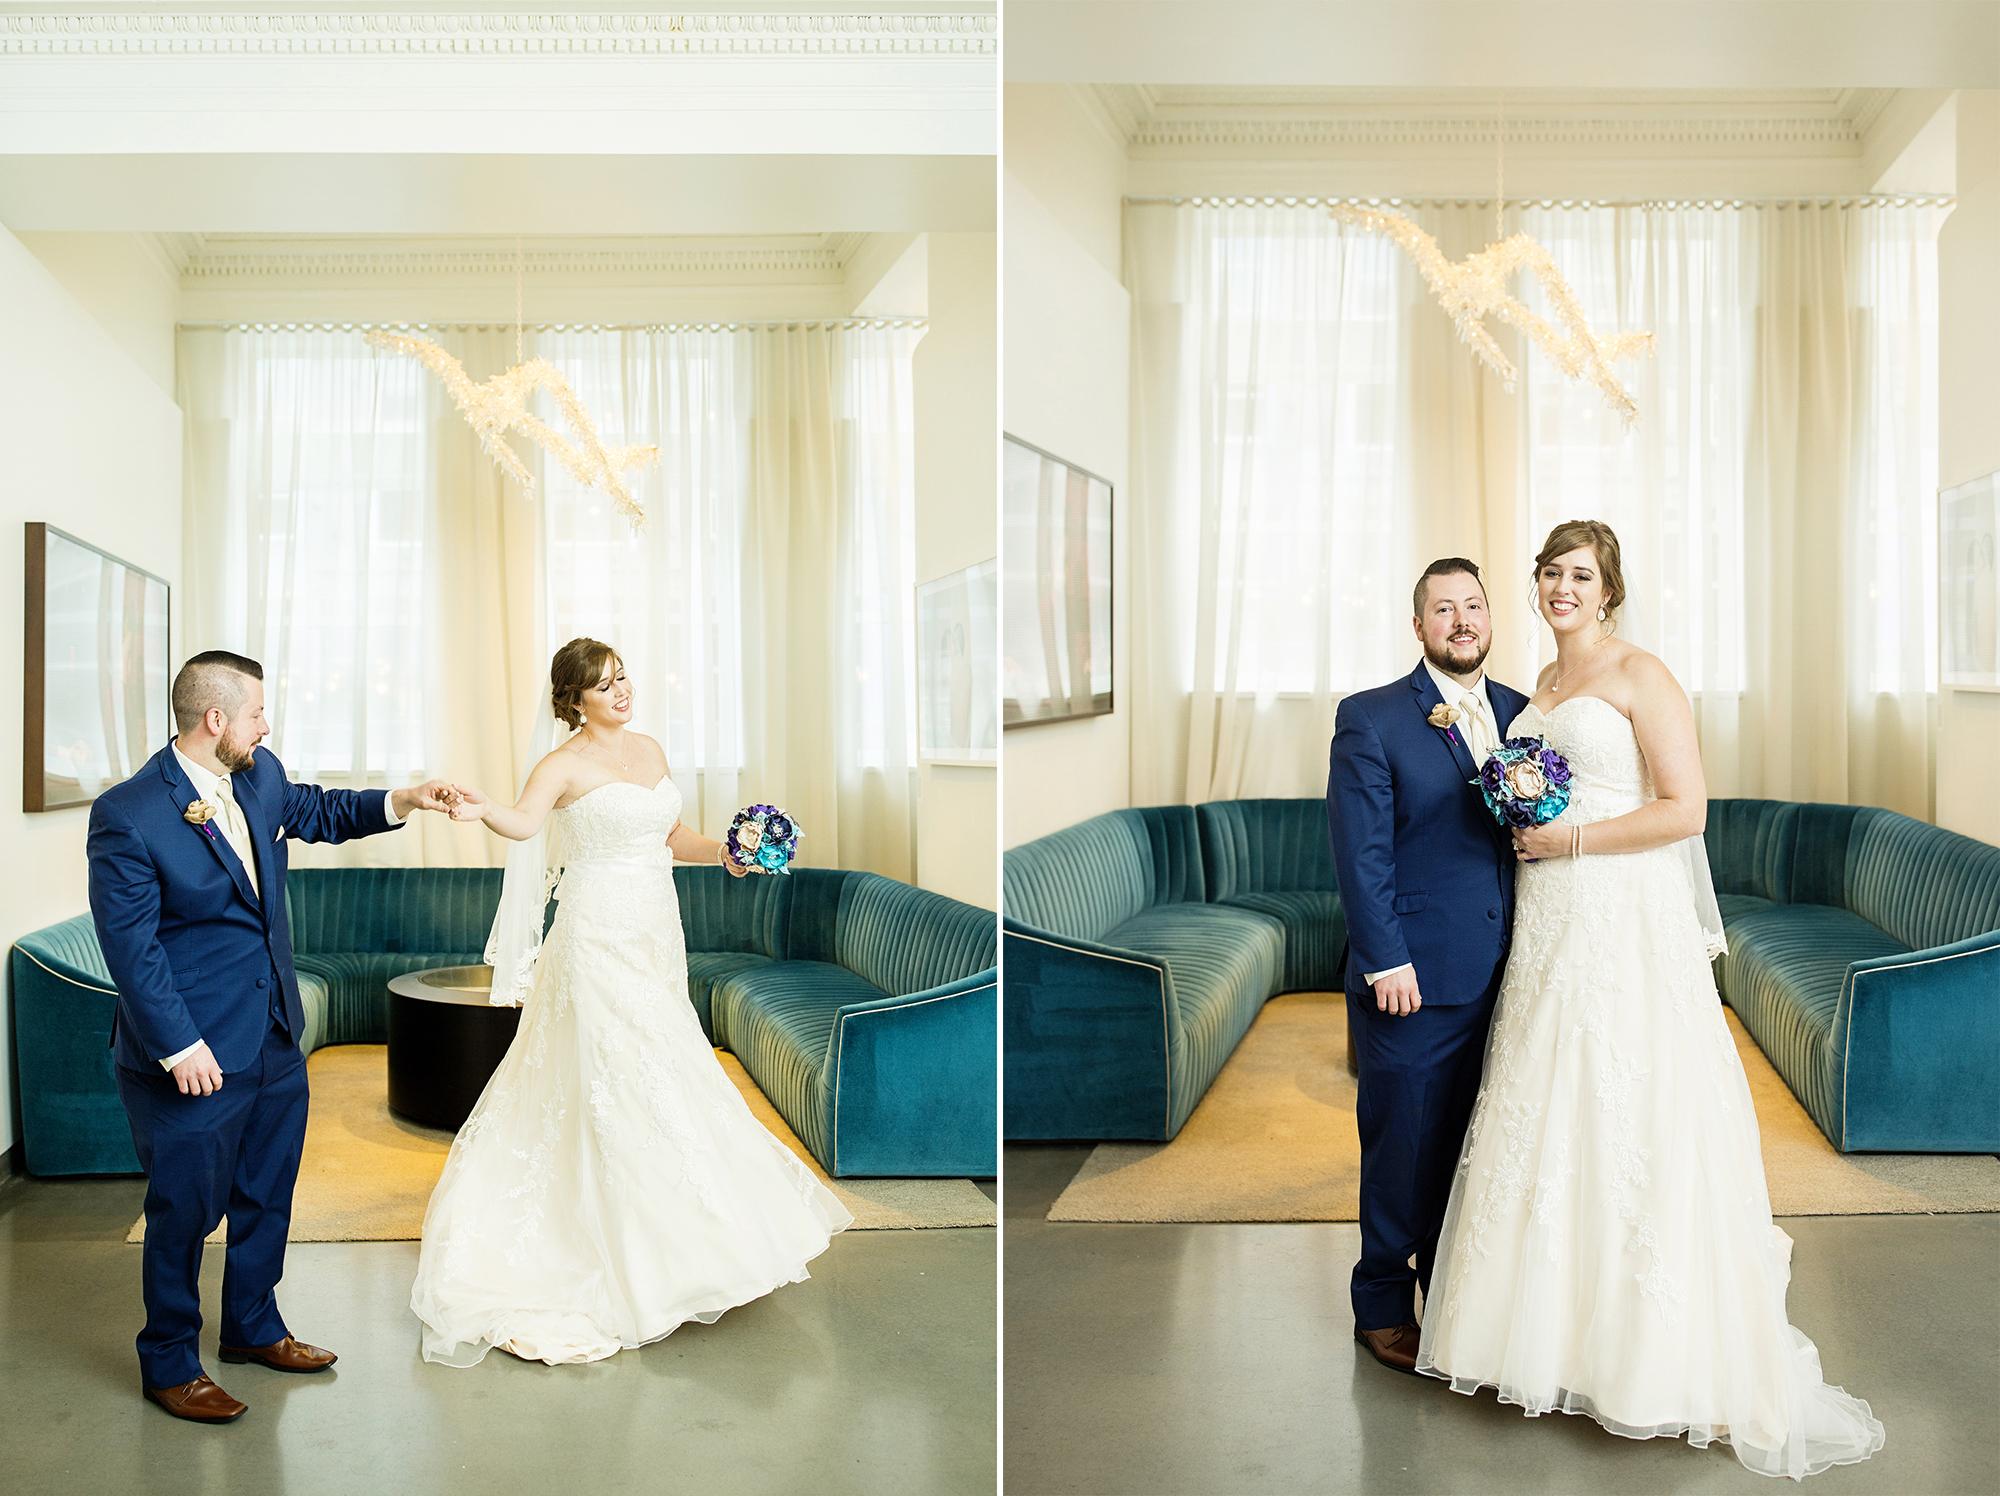 Seriously_Sabrina_Photography_Lexington_Kentucky_21c_Round_Barn_Red_Mile_Wedding_Gorley_34.jpg